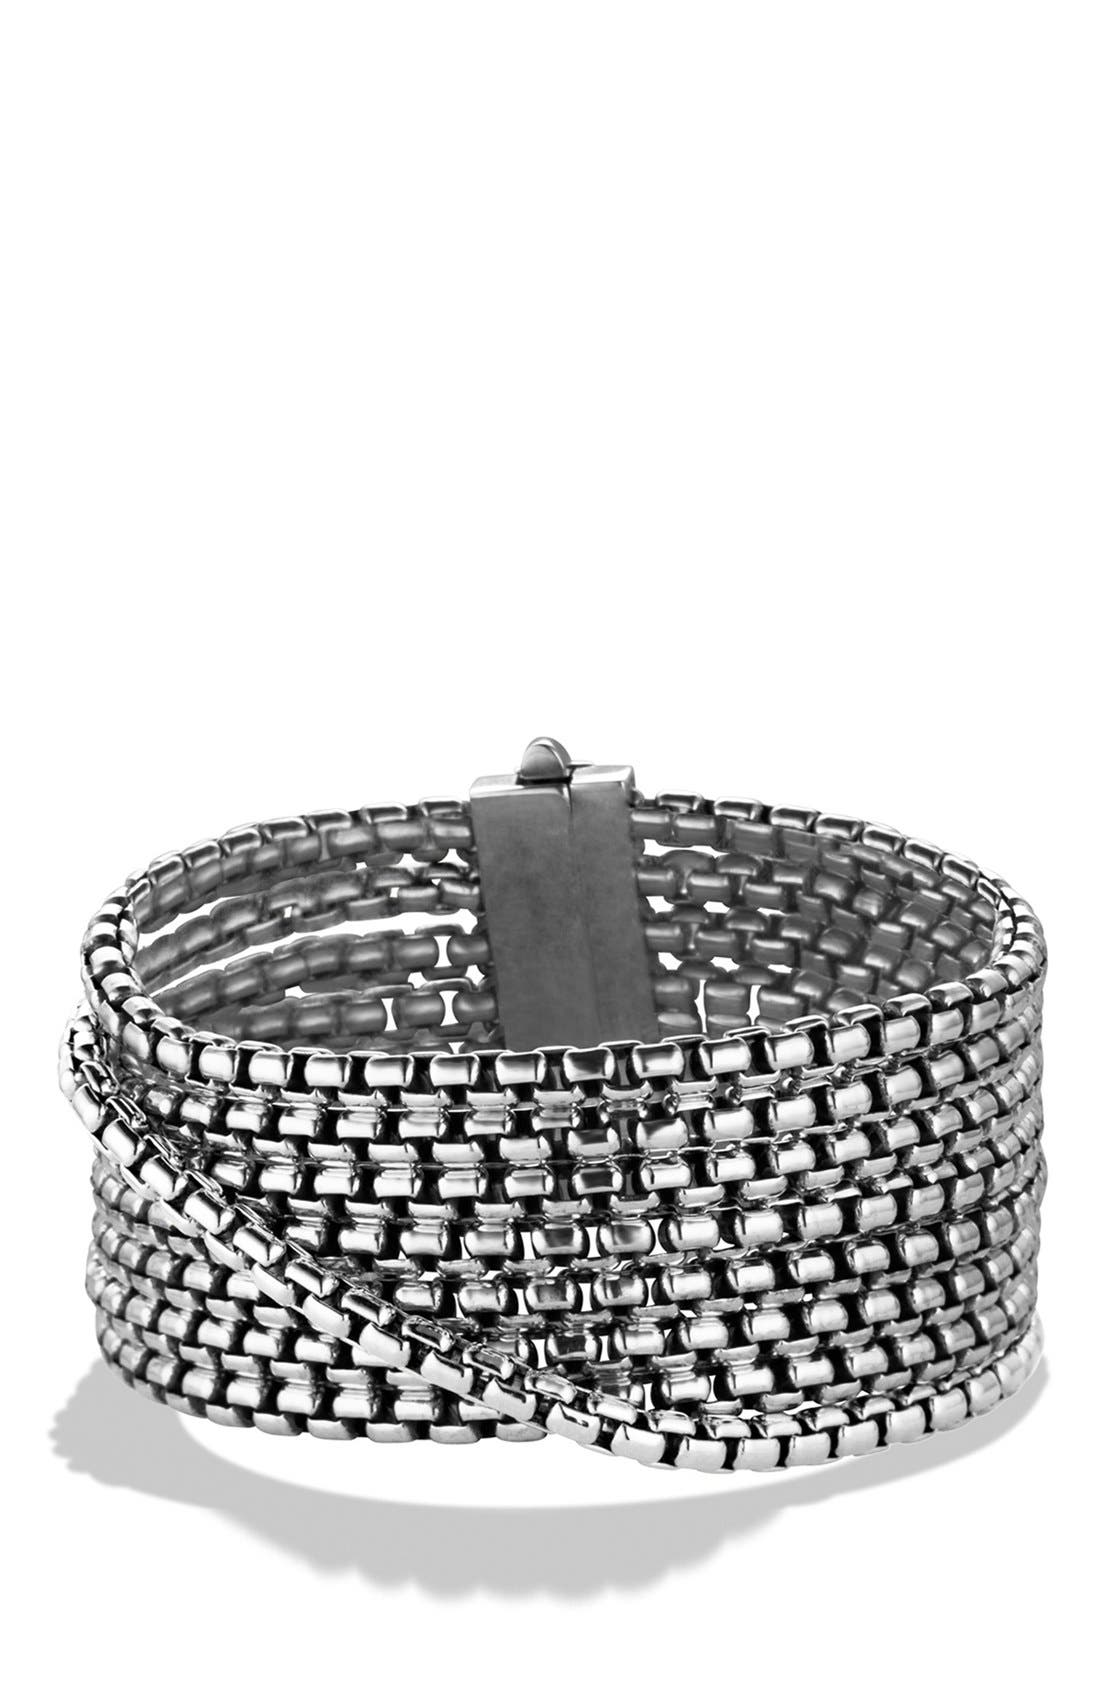 Alternate Image 1 Selected - David Yurman 'Box Chain' 8-Row Bracelet